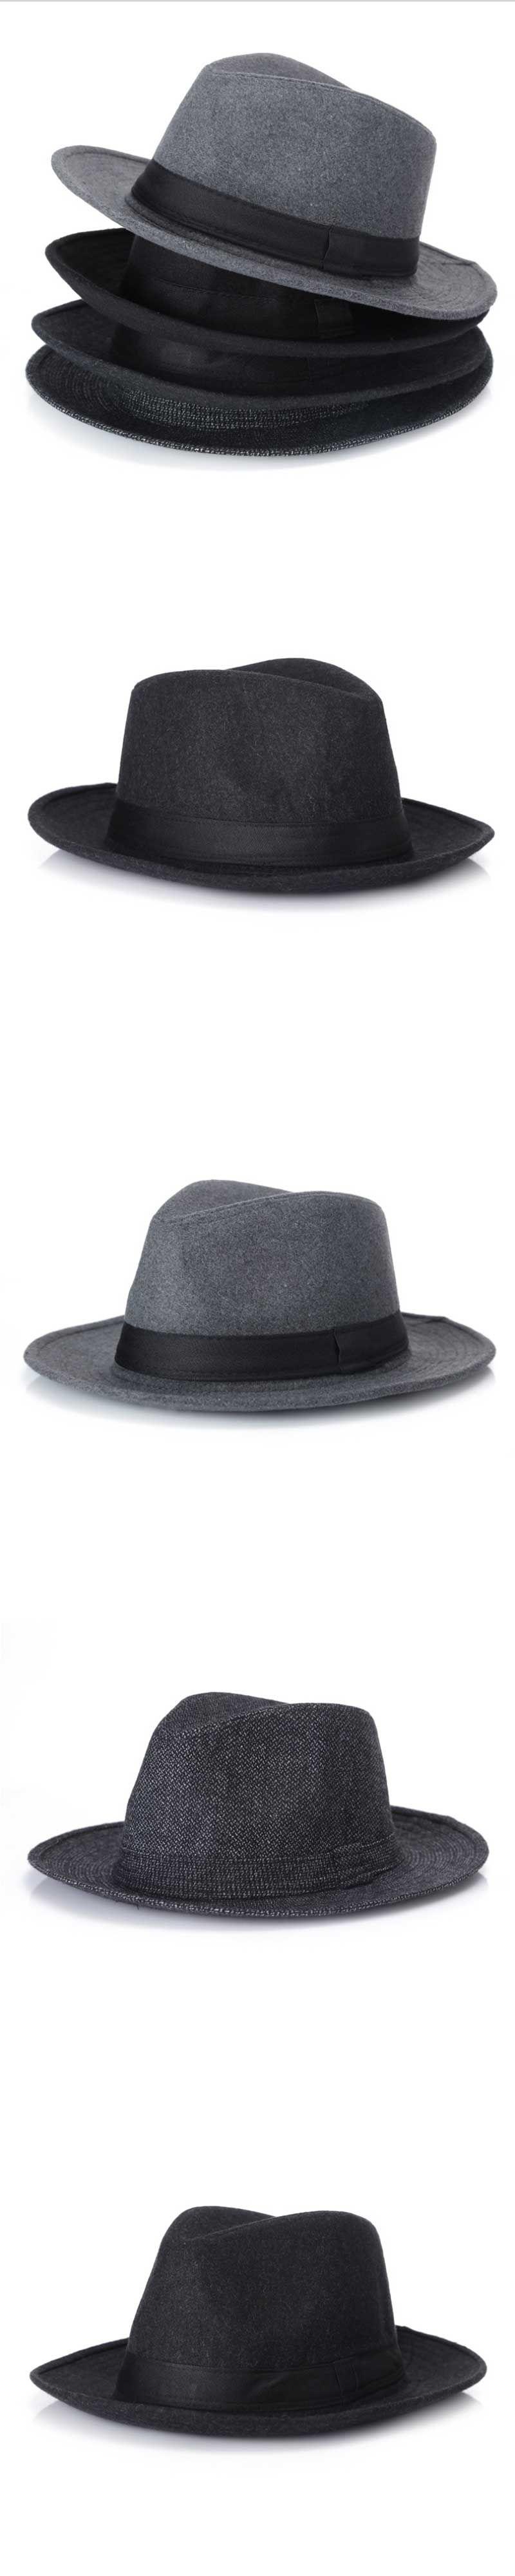 Wool men Black Fedora Hat For Women s Wool Wide Brim JazzChic Cap Vintage  Panama Sun Top 06b1f54934cb